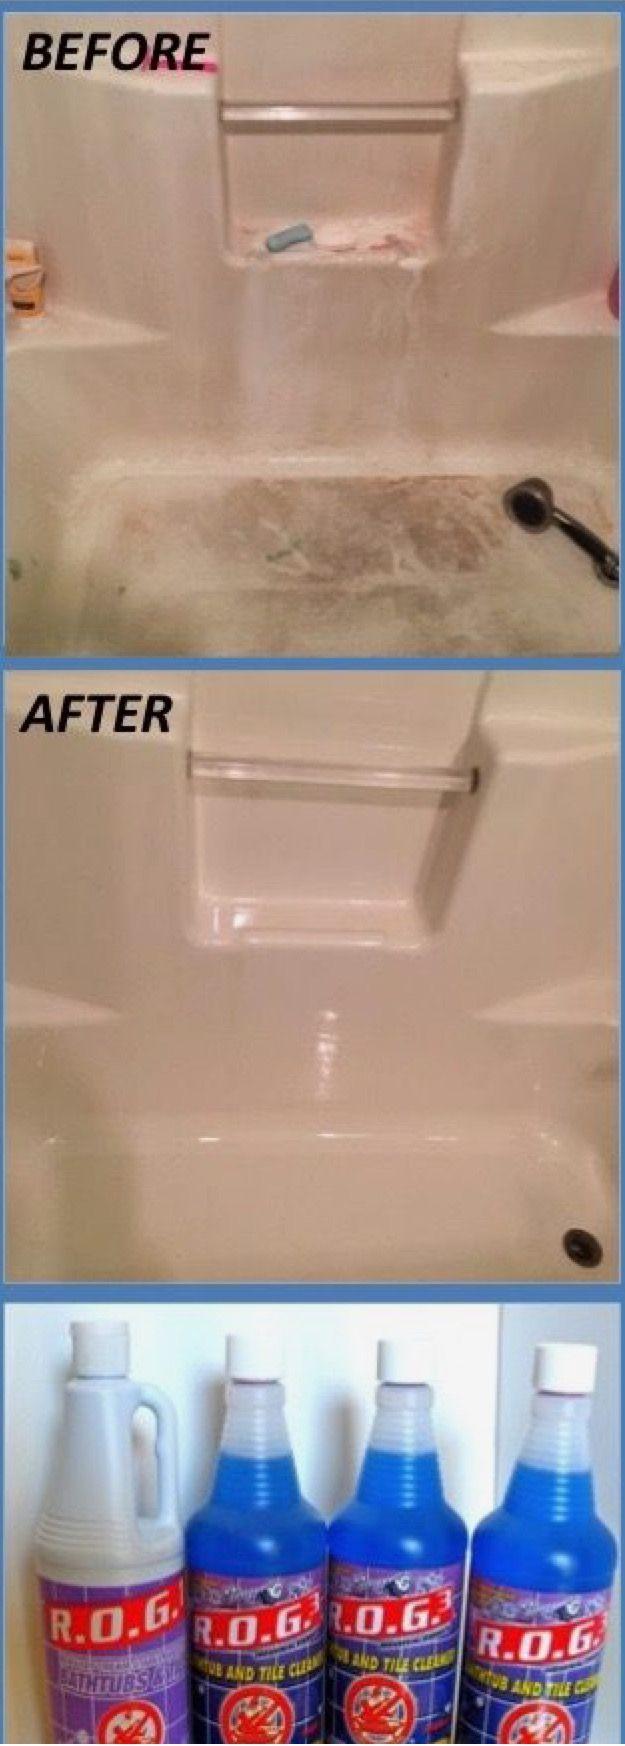 Best Fiberglass Cleaner Cleaning Fiberglass Tub Bathtub Cleaner